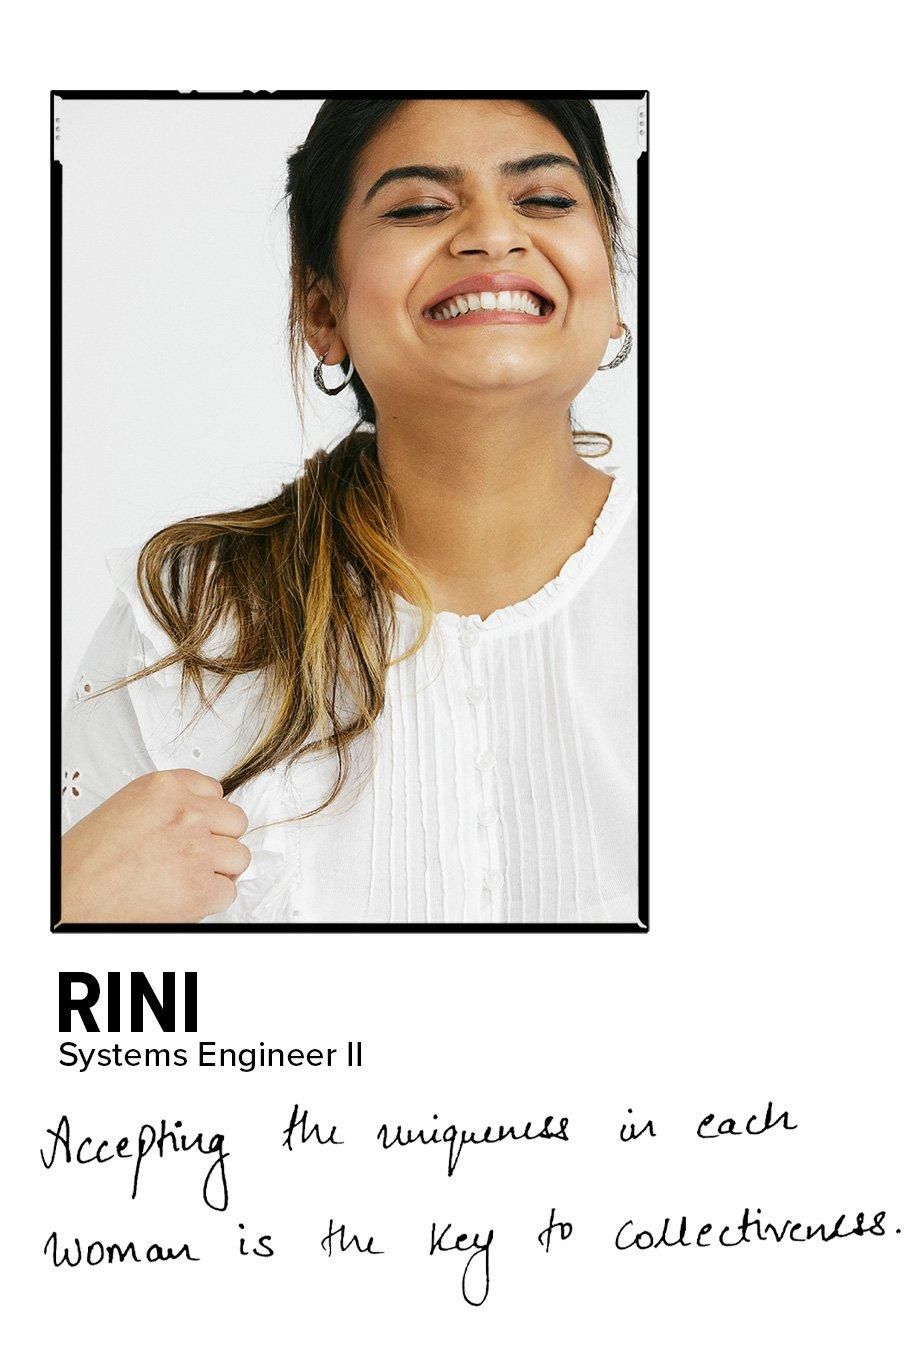 Rini - Systems Engineer II